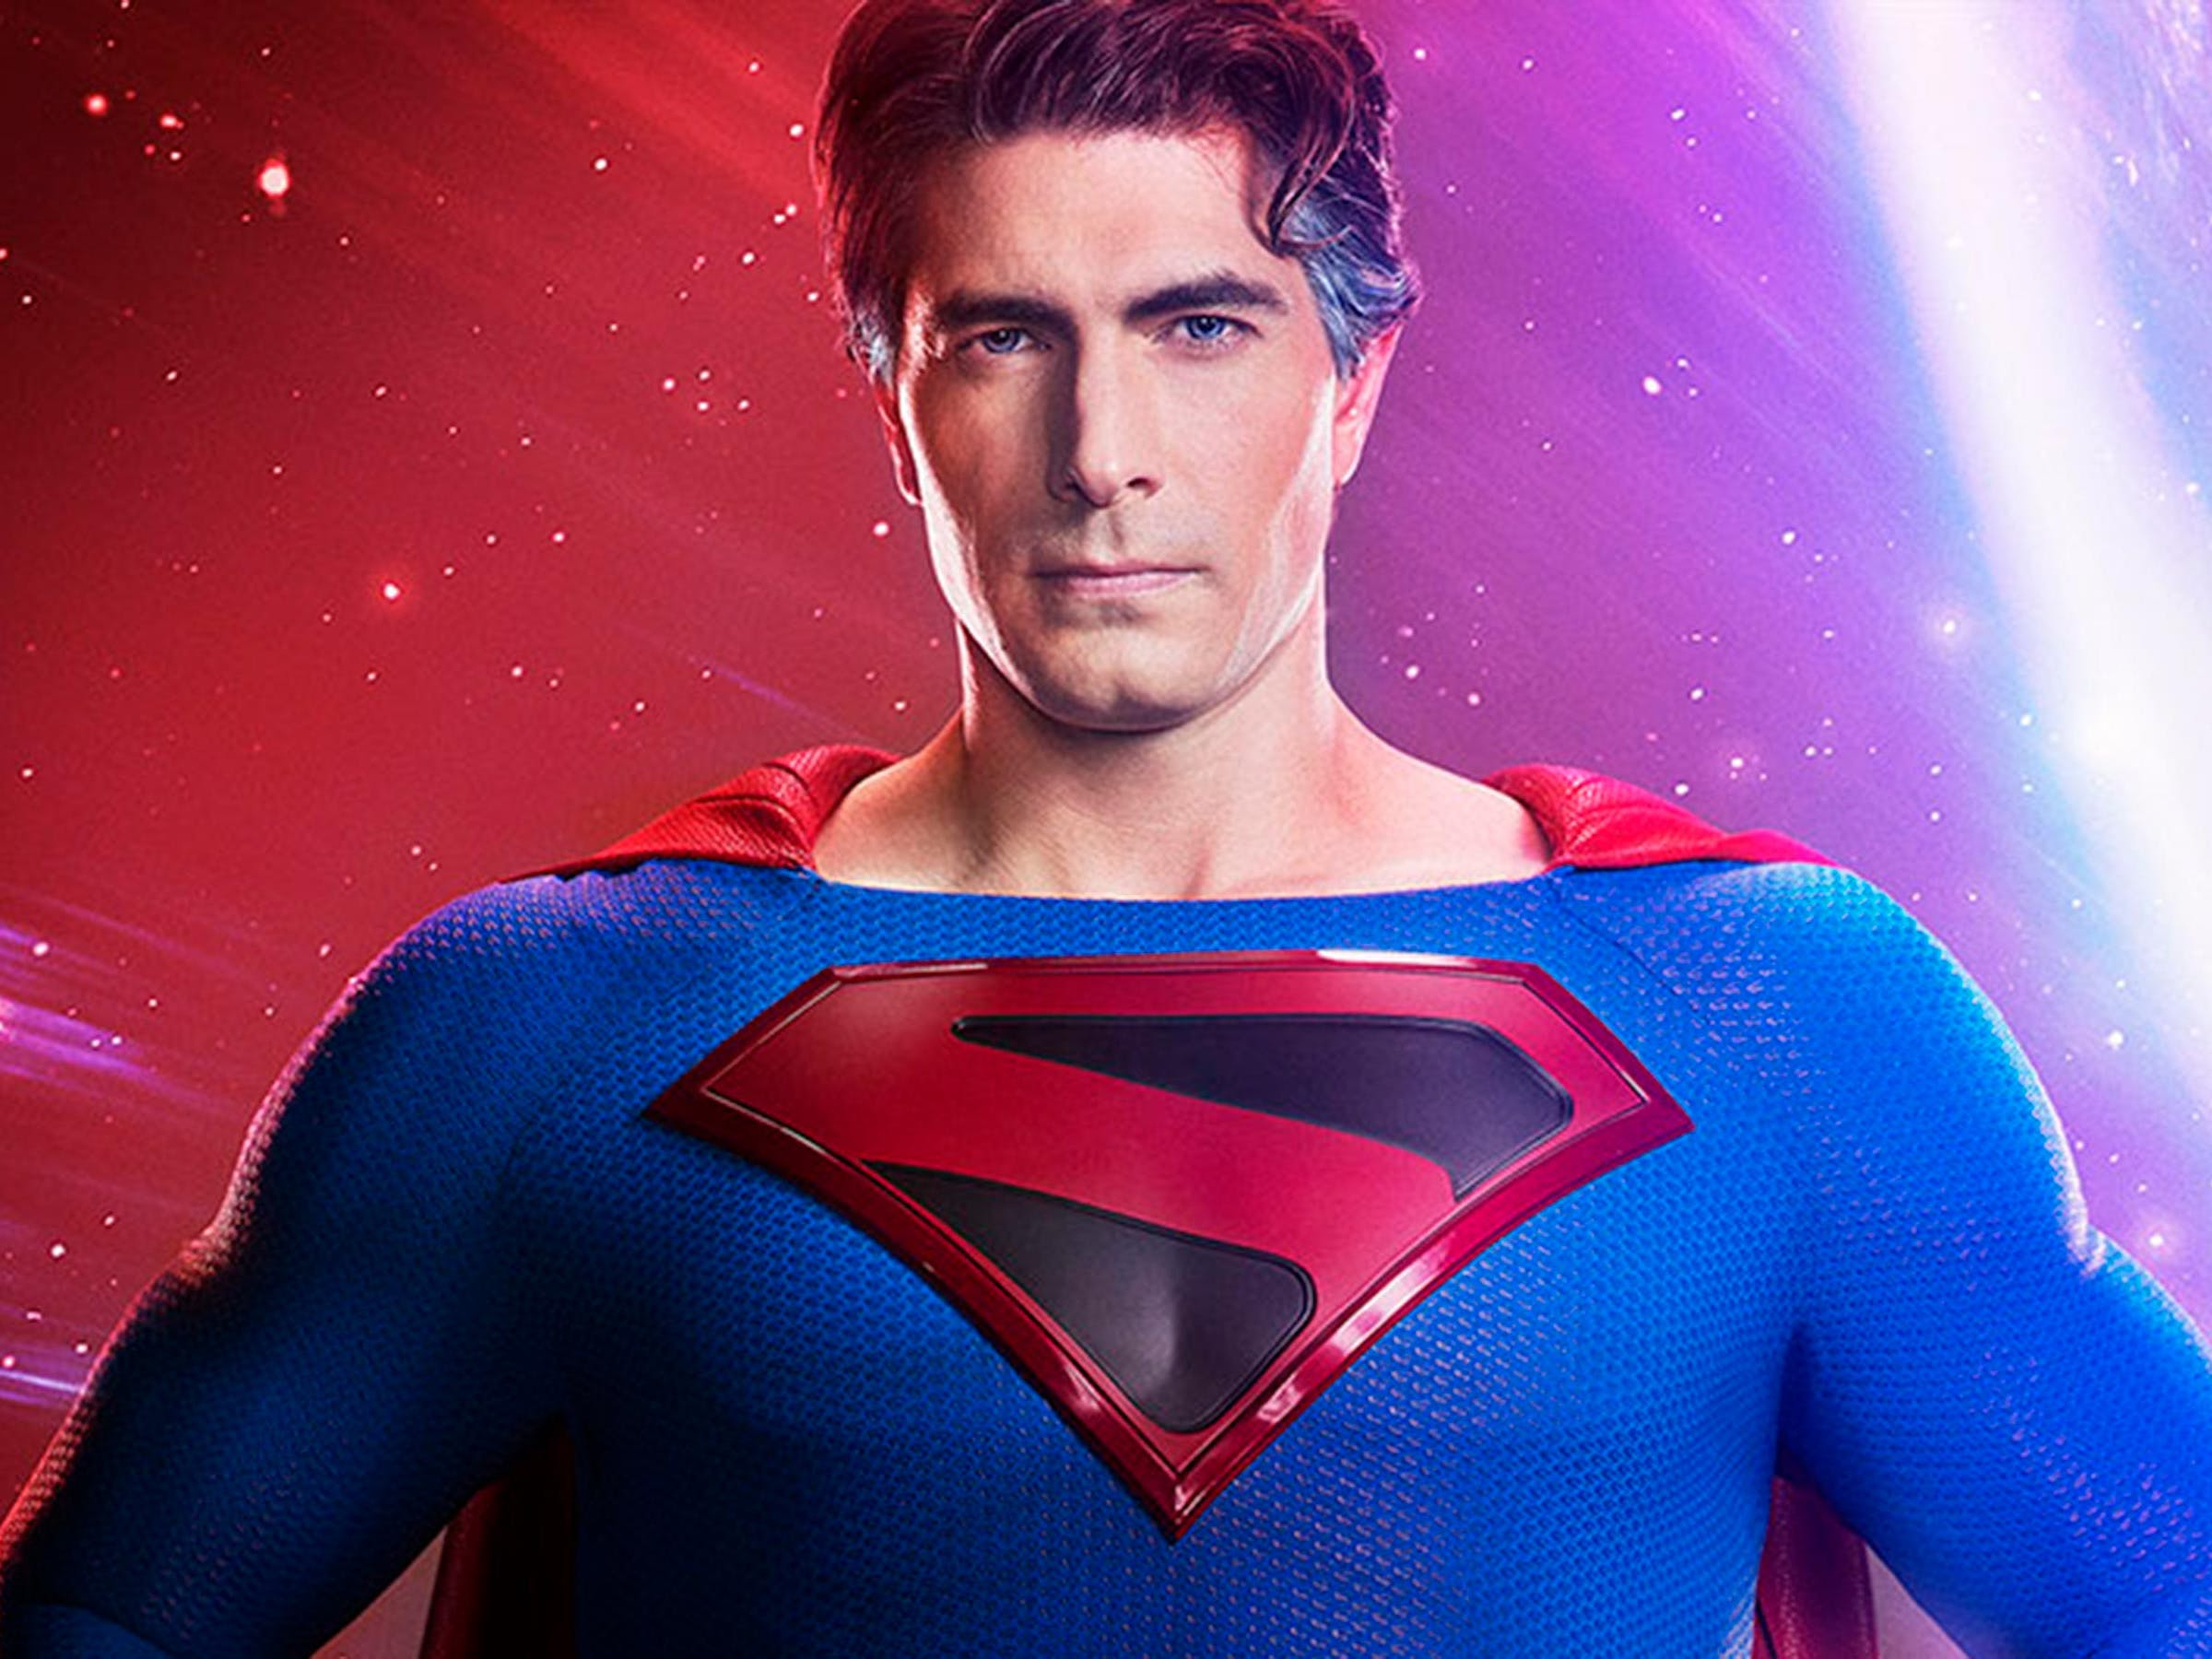 crisis on infinite earths comics dc arrowverse brandon routh superman